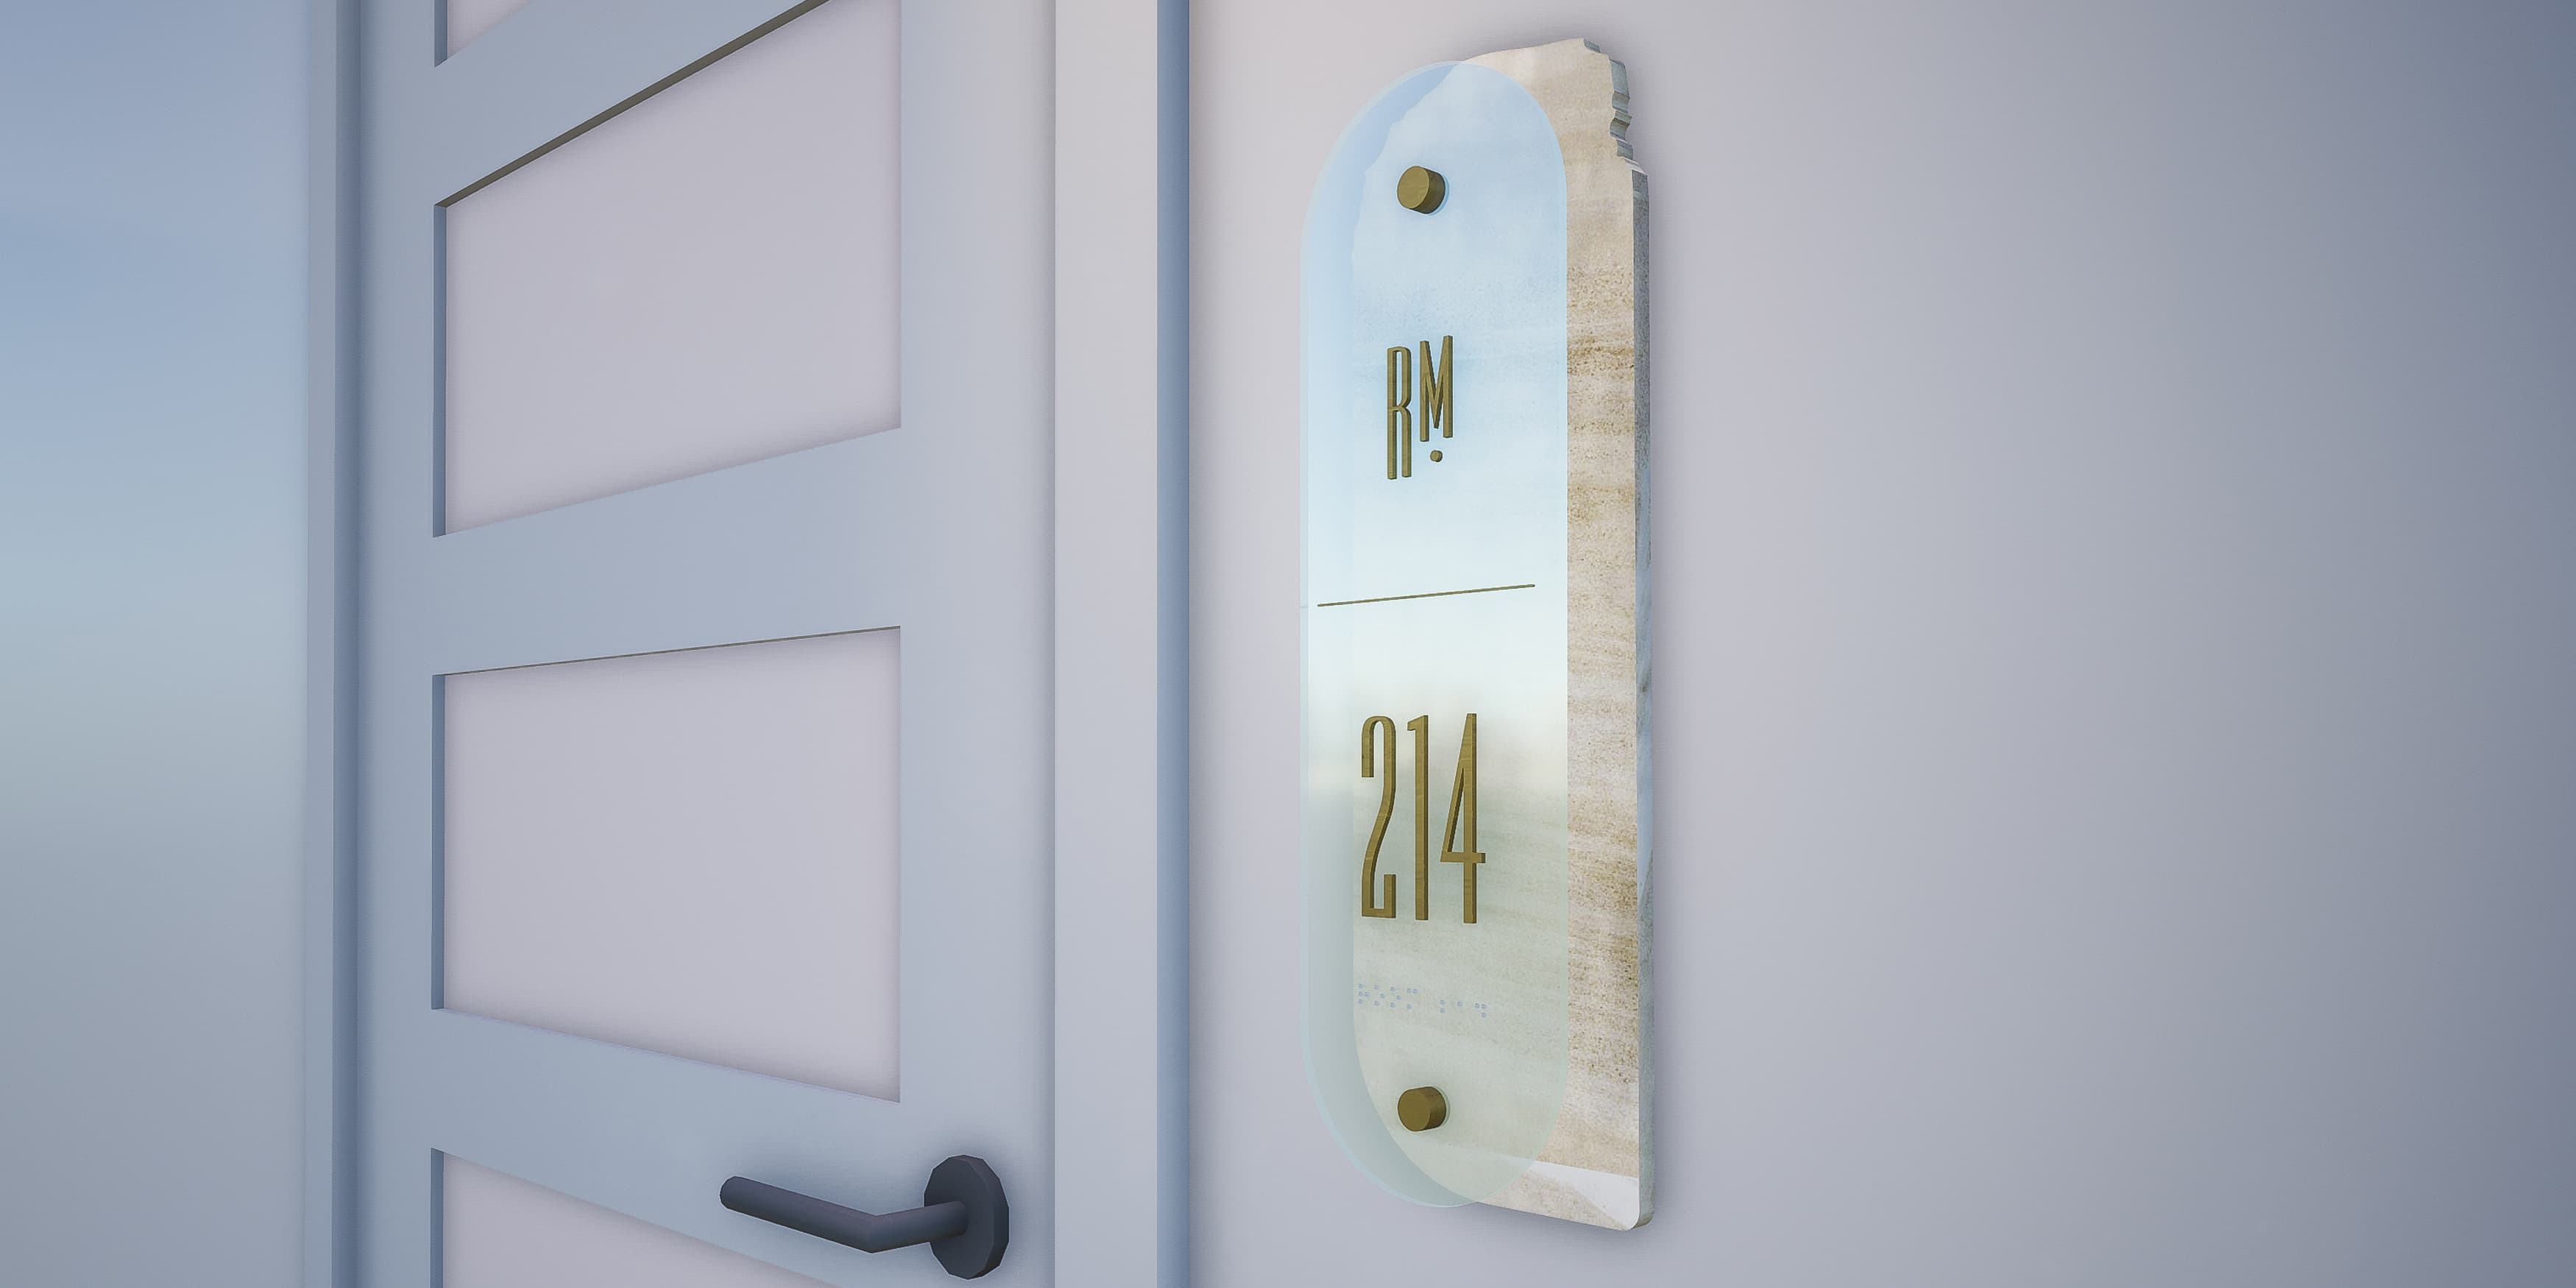 St. Regis Longboat, in Longboat Key, Florida, room number identity sign